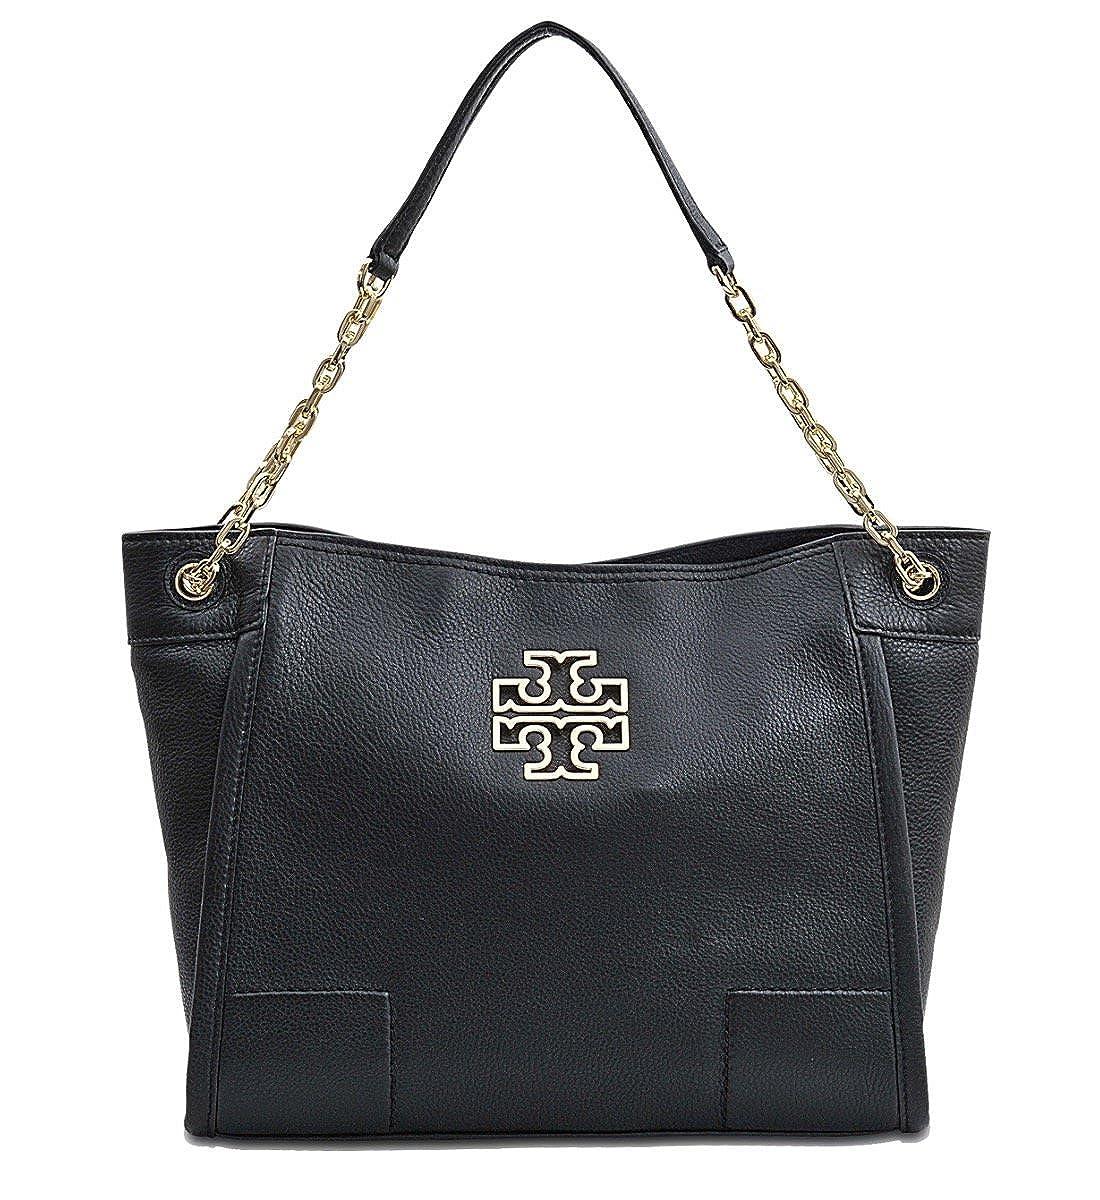 eb4e329f73d3 Amazon.com  Tory Burch Britten Small Slouchy Tote Bag In Black 8170  Shoes